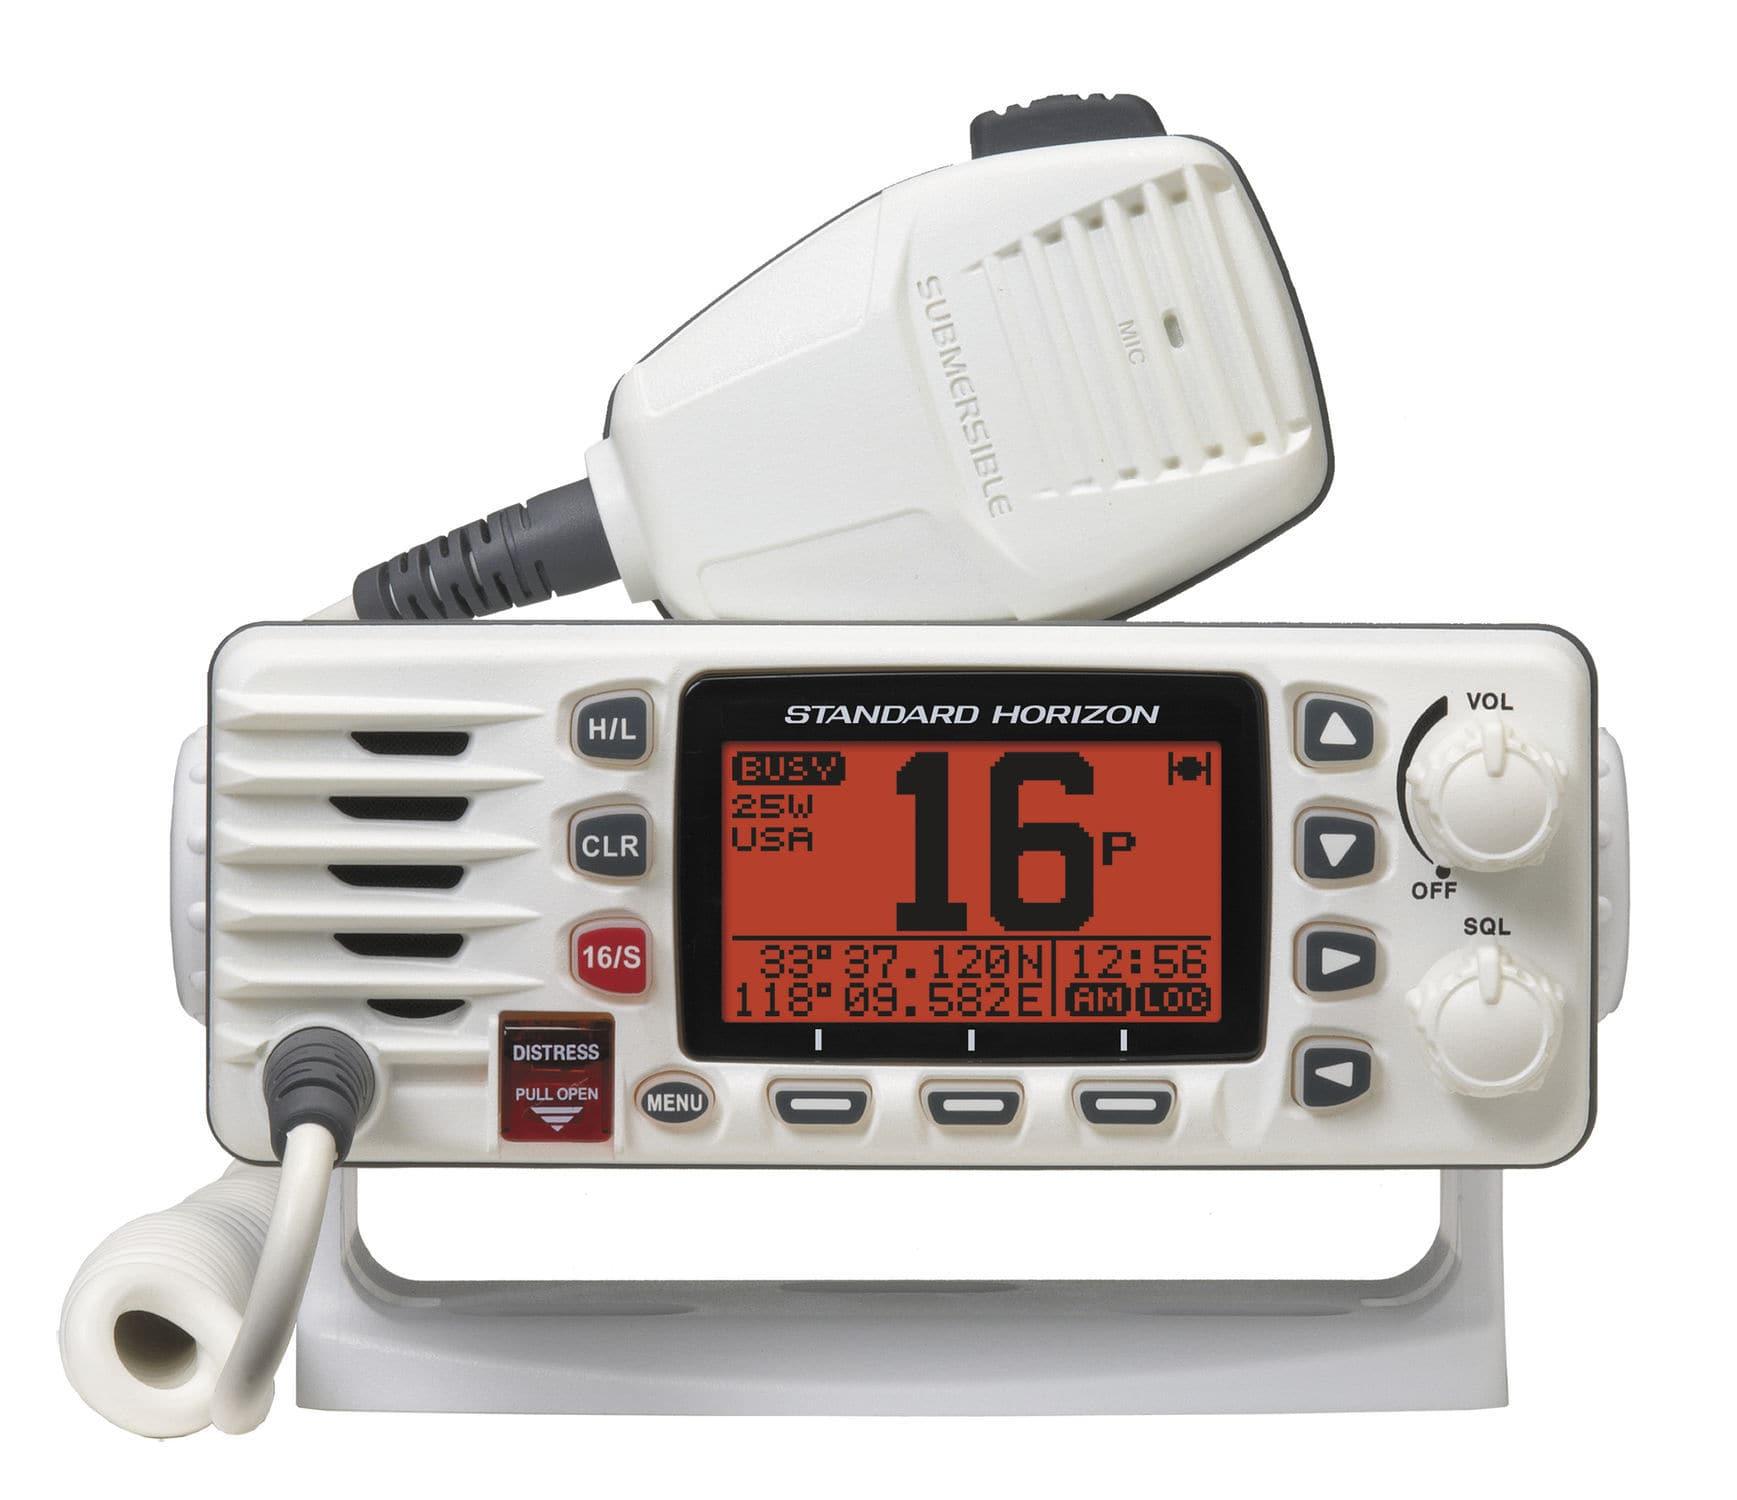 Boat Radio Fixed Vhf Ipx8 Eclipse Gx1300 Standard Horizon Wiring